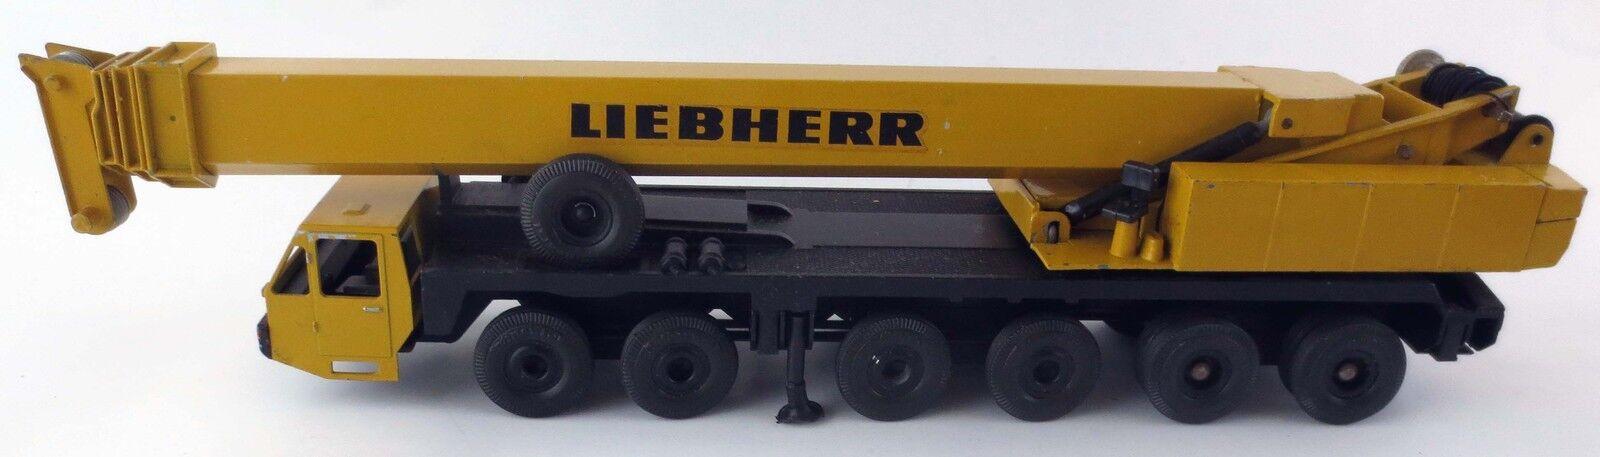 Gescha 2072 Liebherr Mobilkran LT1100 Autokran 1 50 1 50 Hydraulikkran 3072 Kran